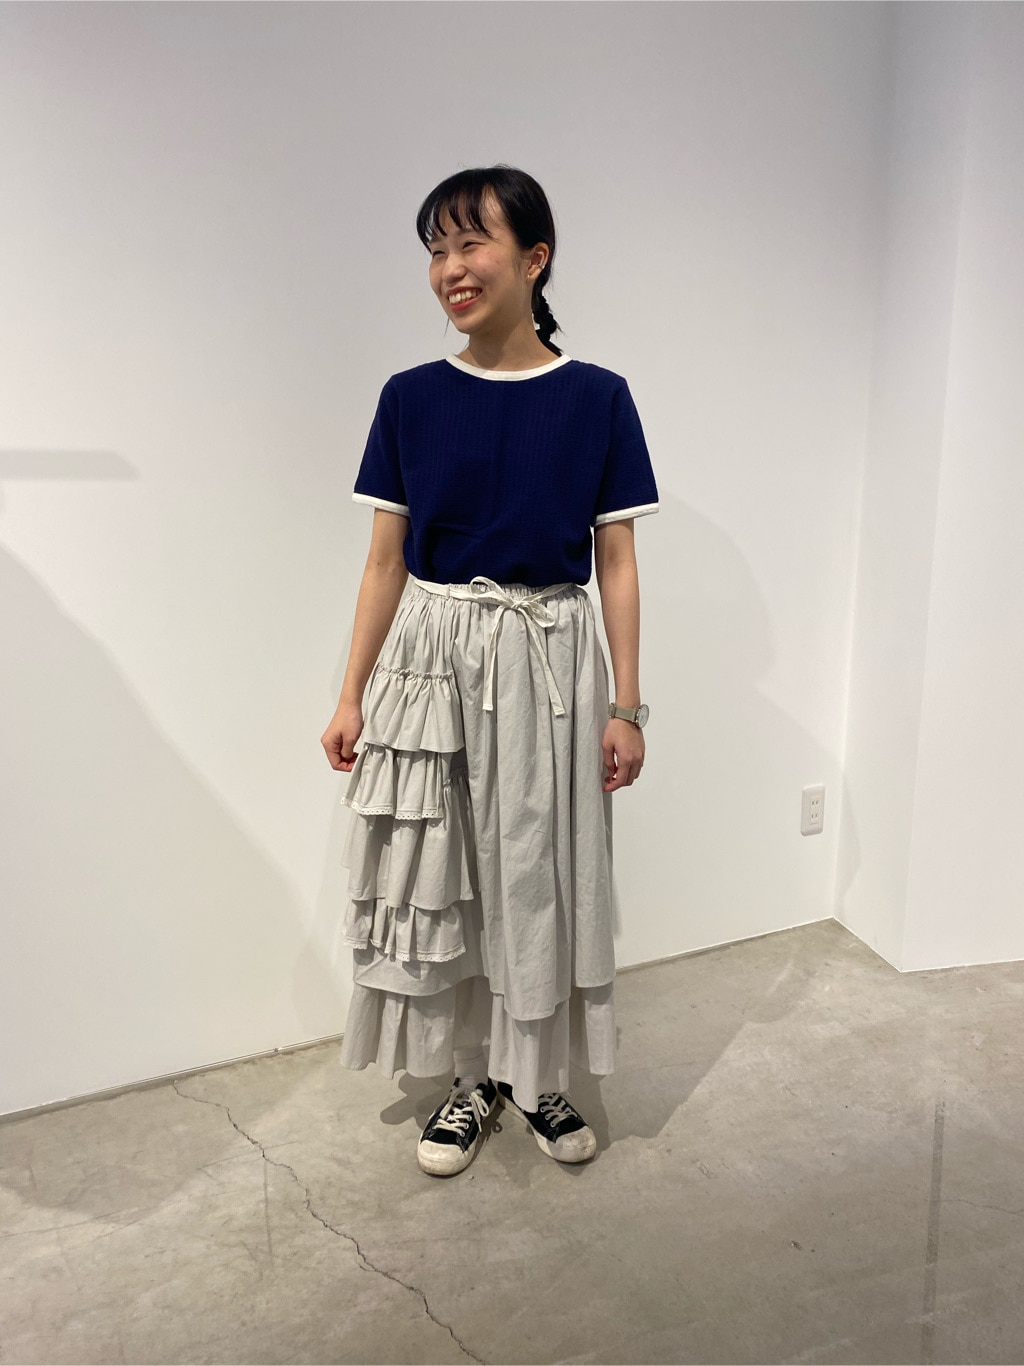 l'atelier du savon 名古屋栄路面 身長:152cm 2020.05.15